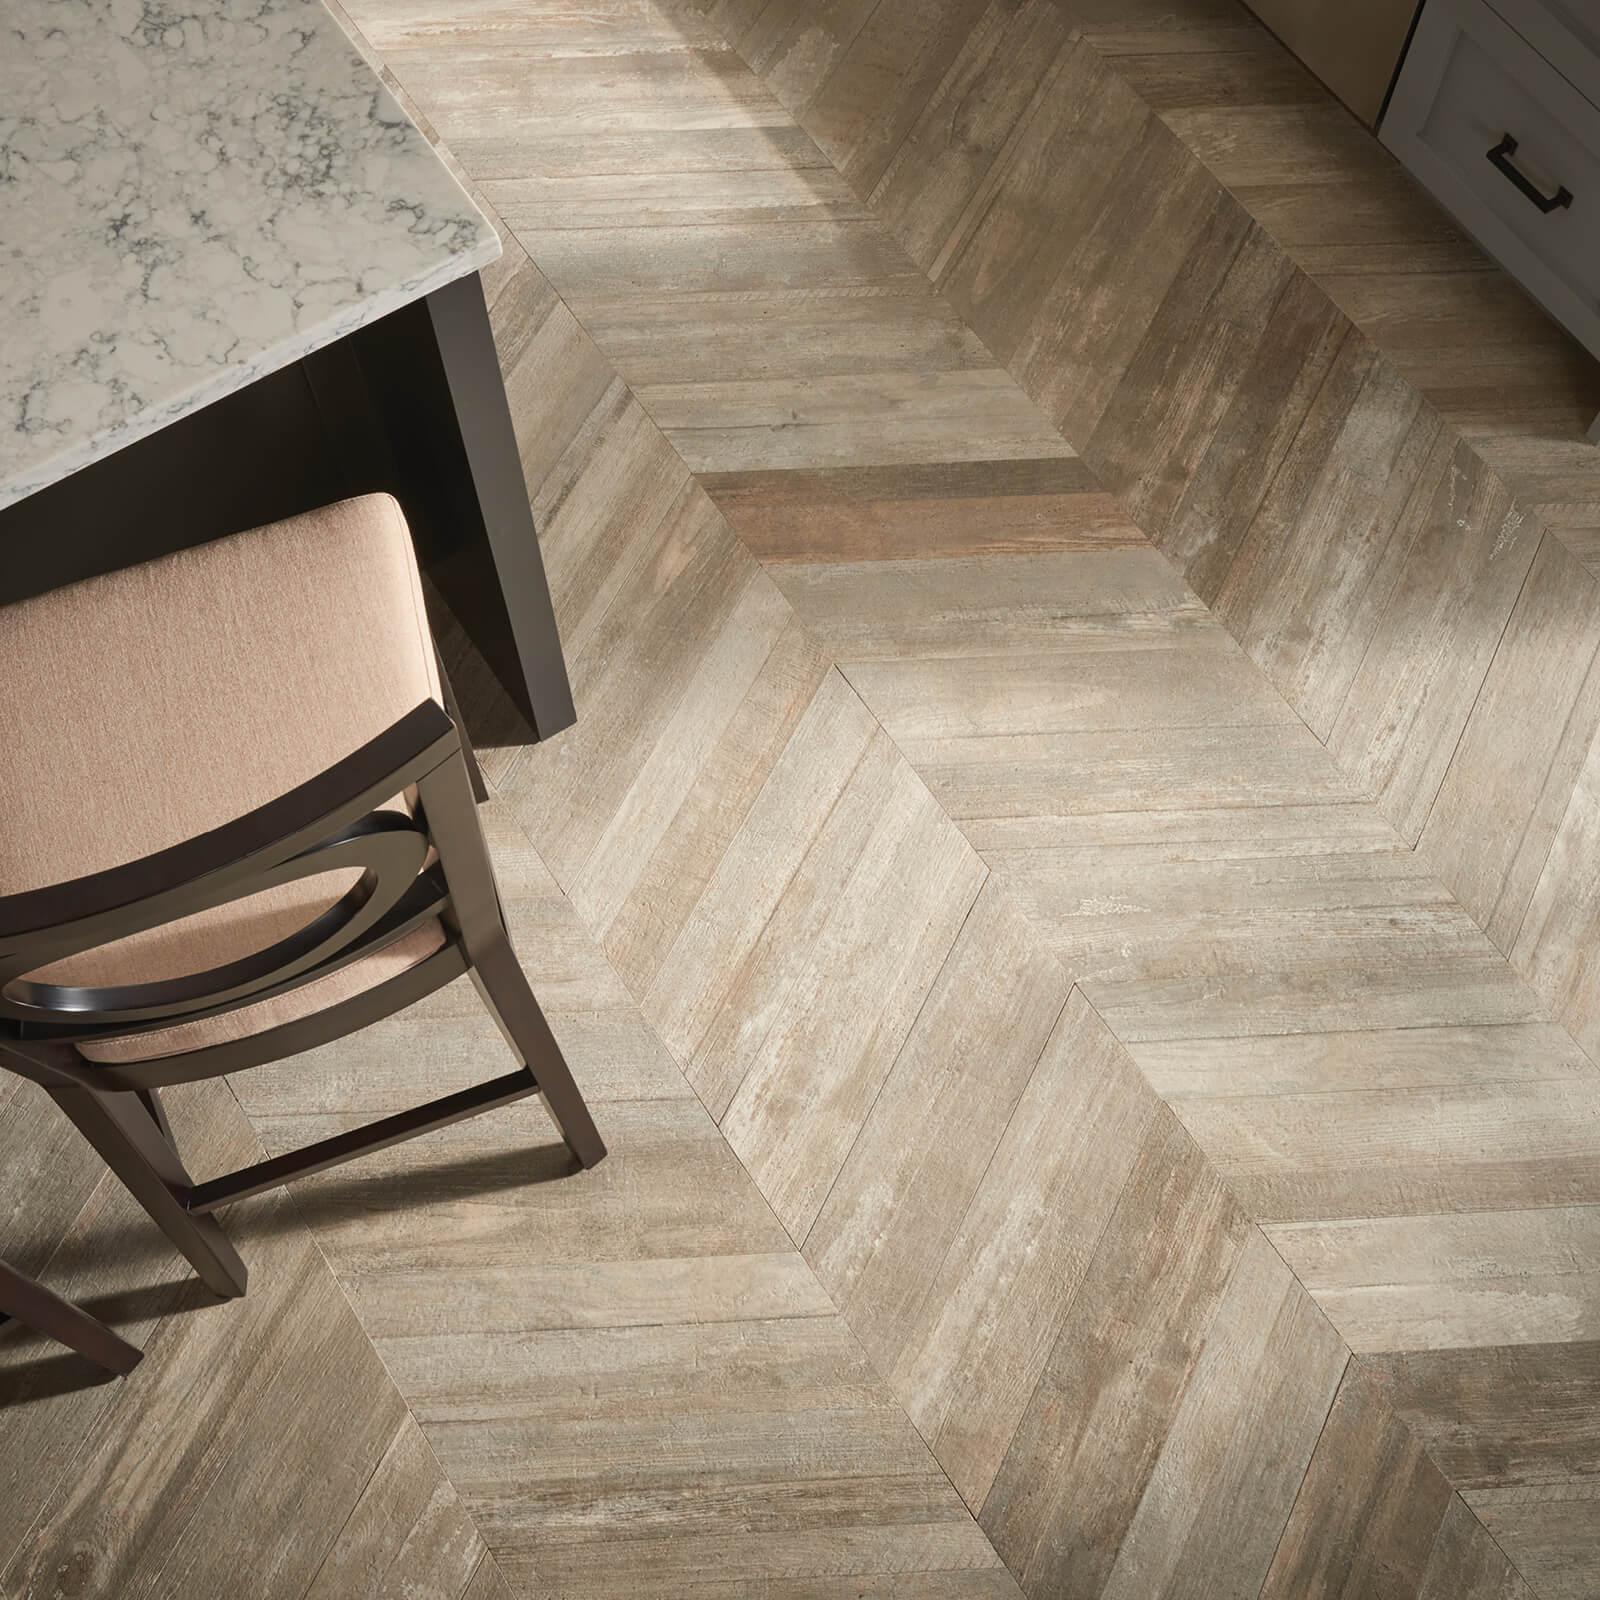 Glee chevron flooring | Flooring By Design